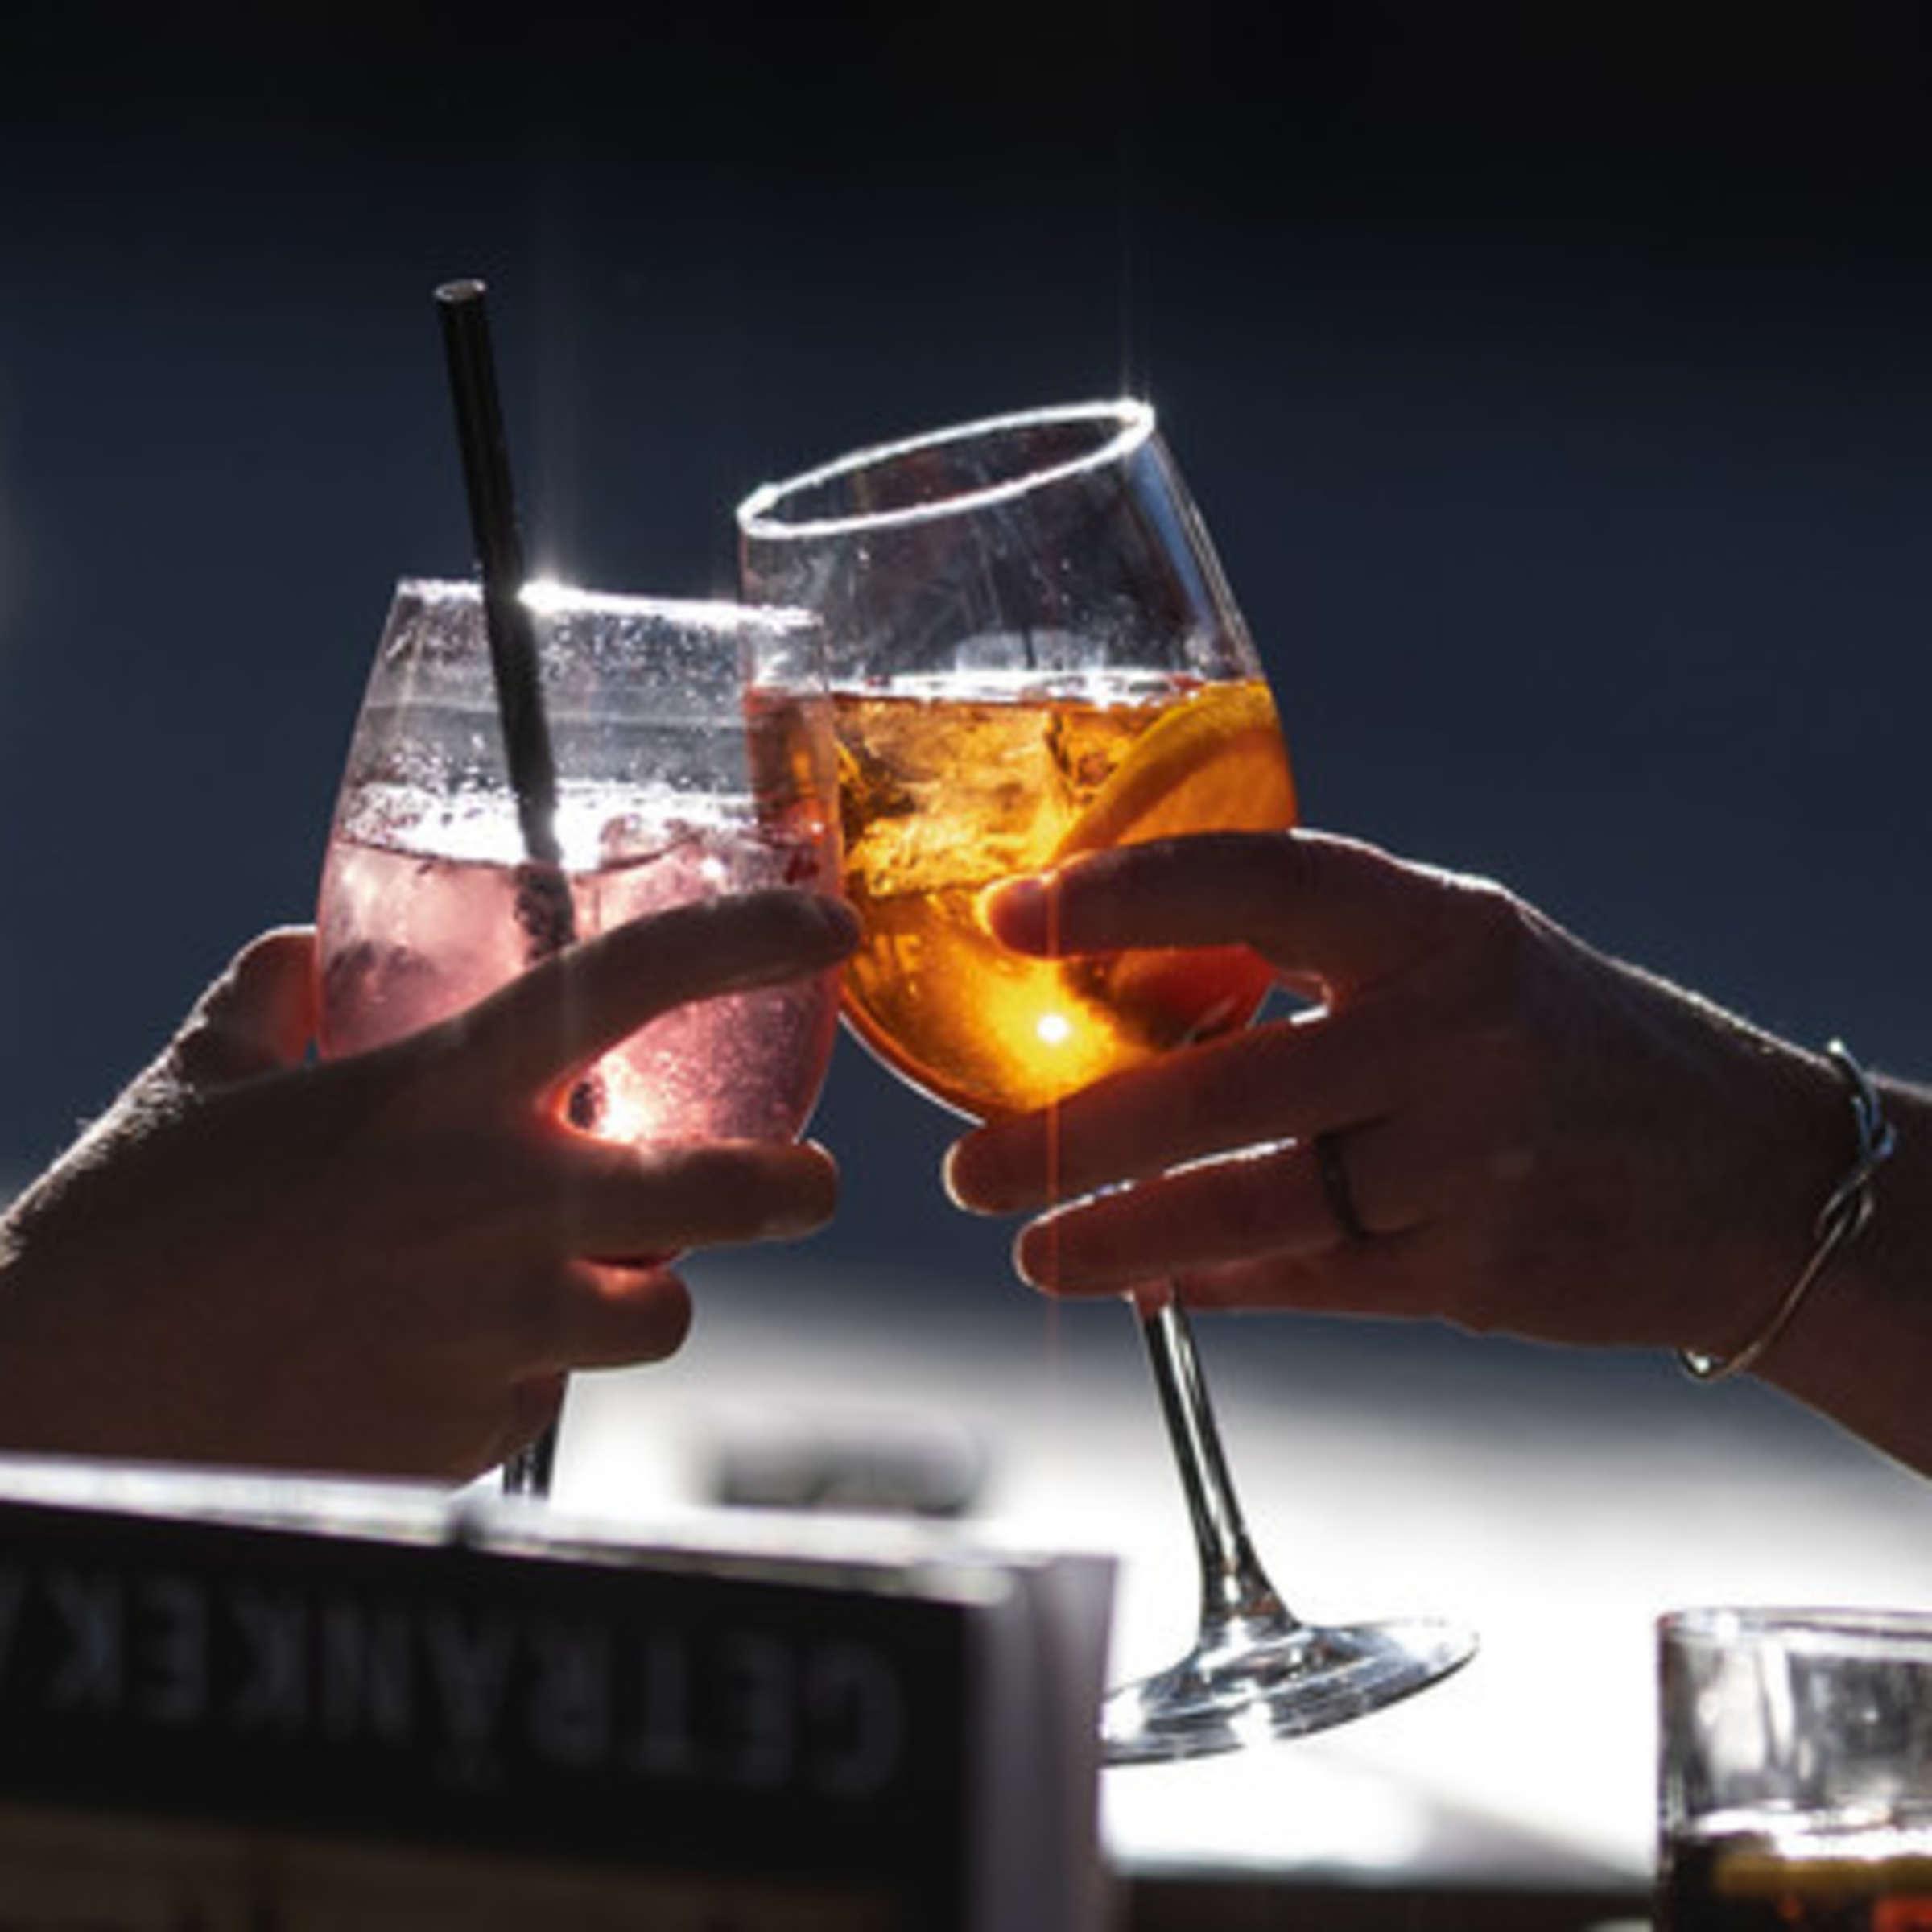 Frauen trinken wenn alkohol Alkoholismus erkennen: